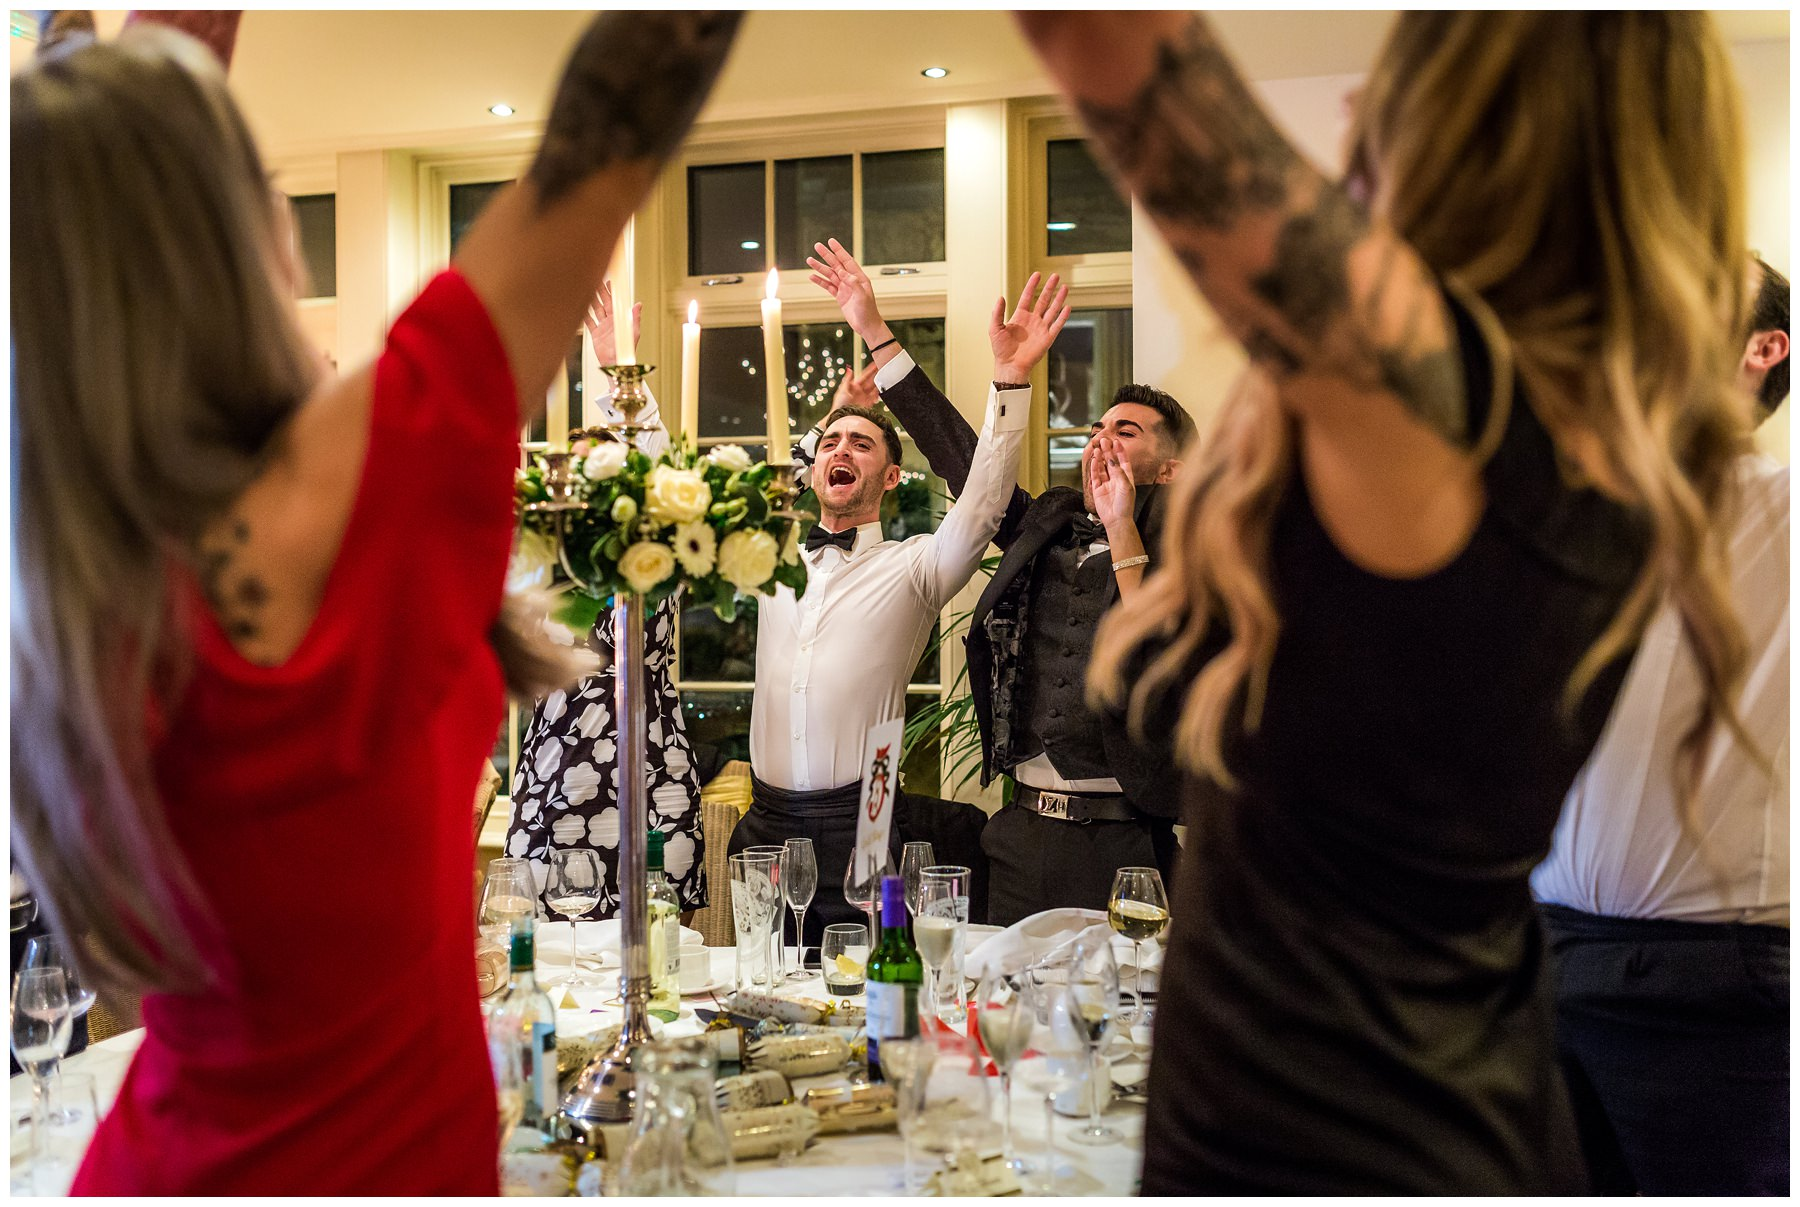 shot of guest singing christmas carols after wedding breakfast